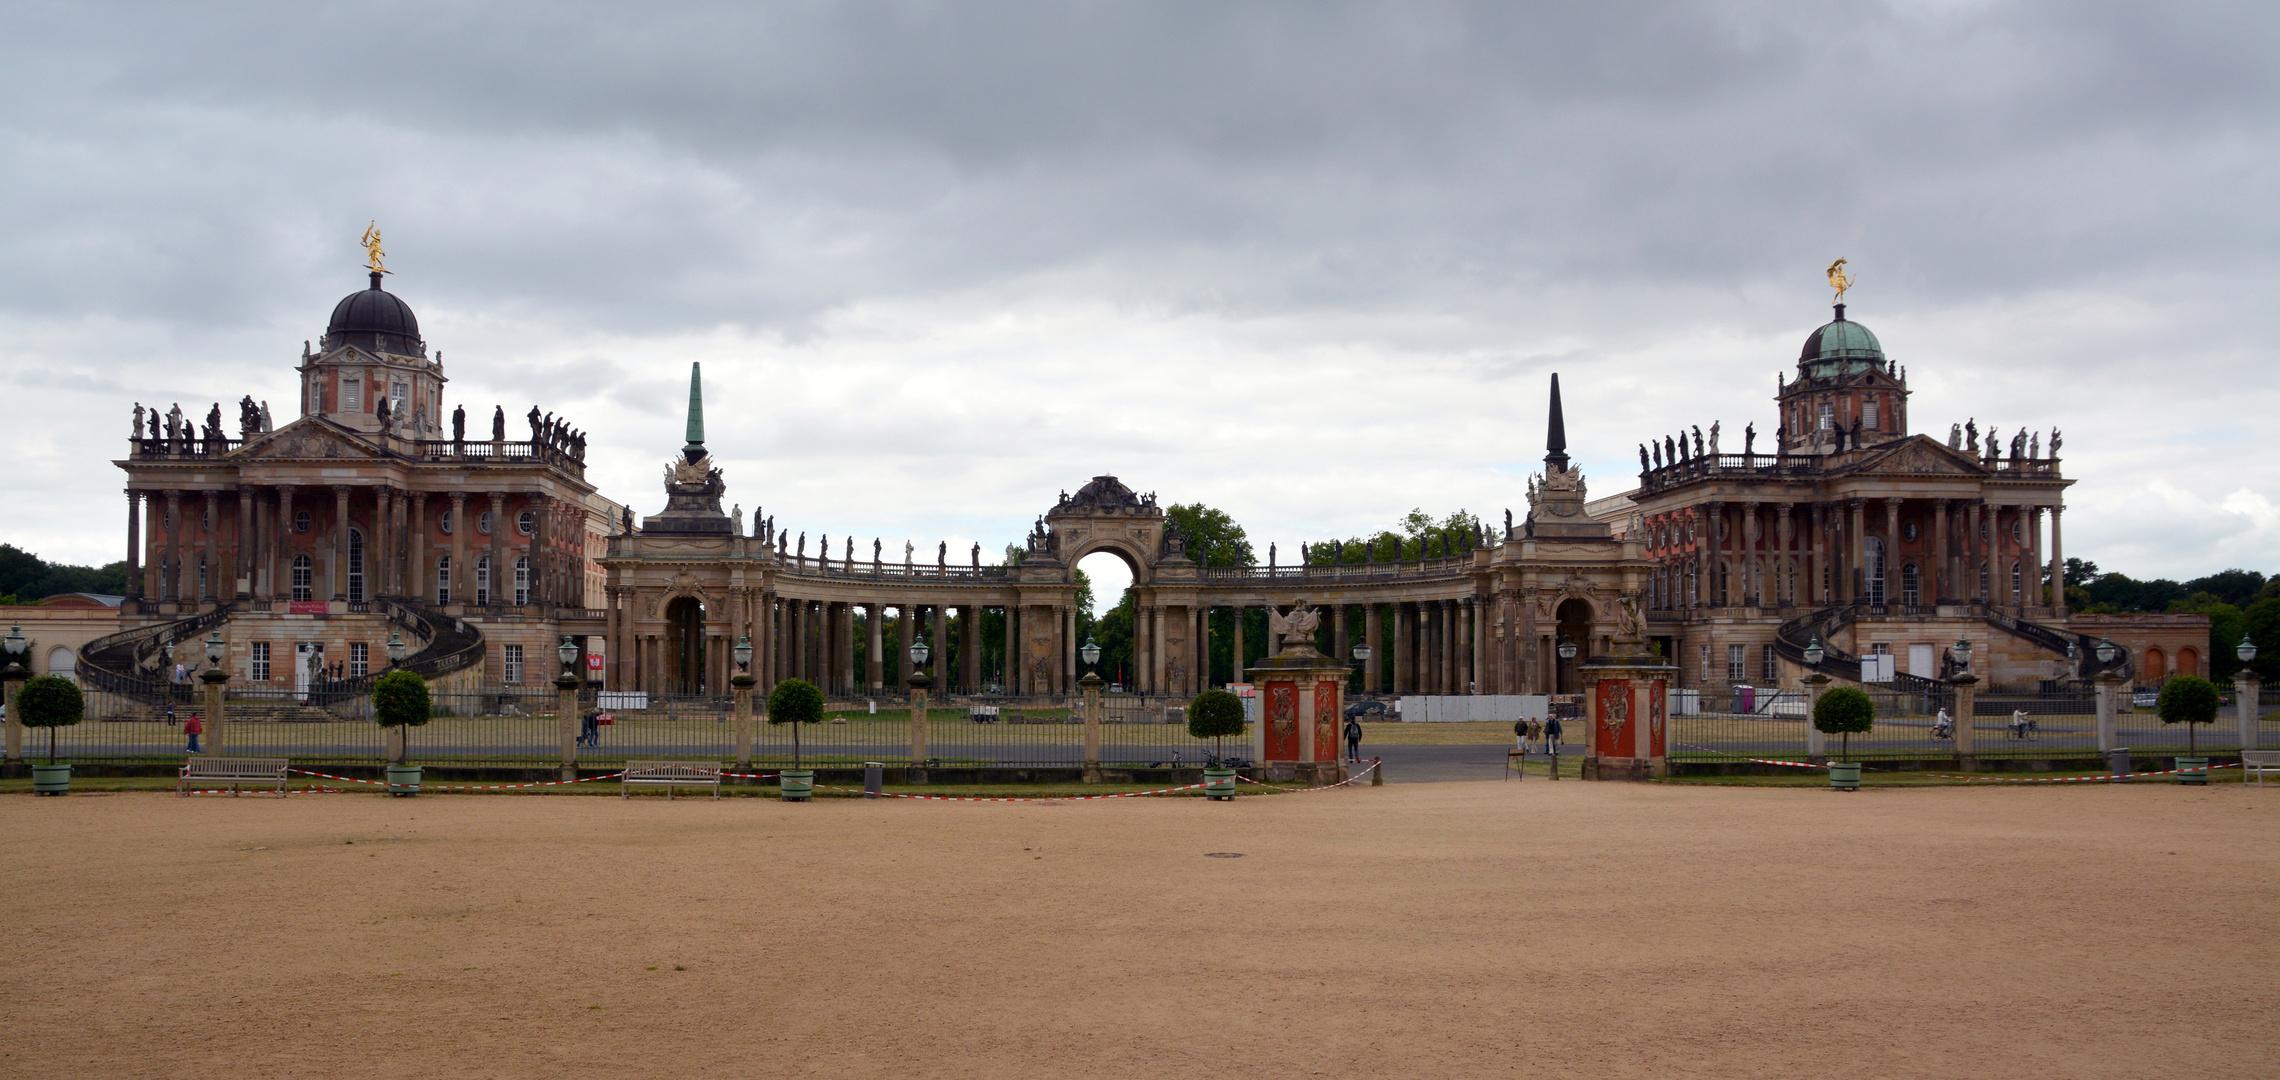 Potsdam Palais-5 Park